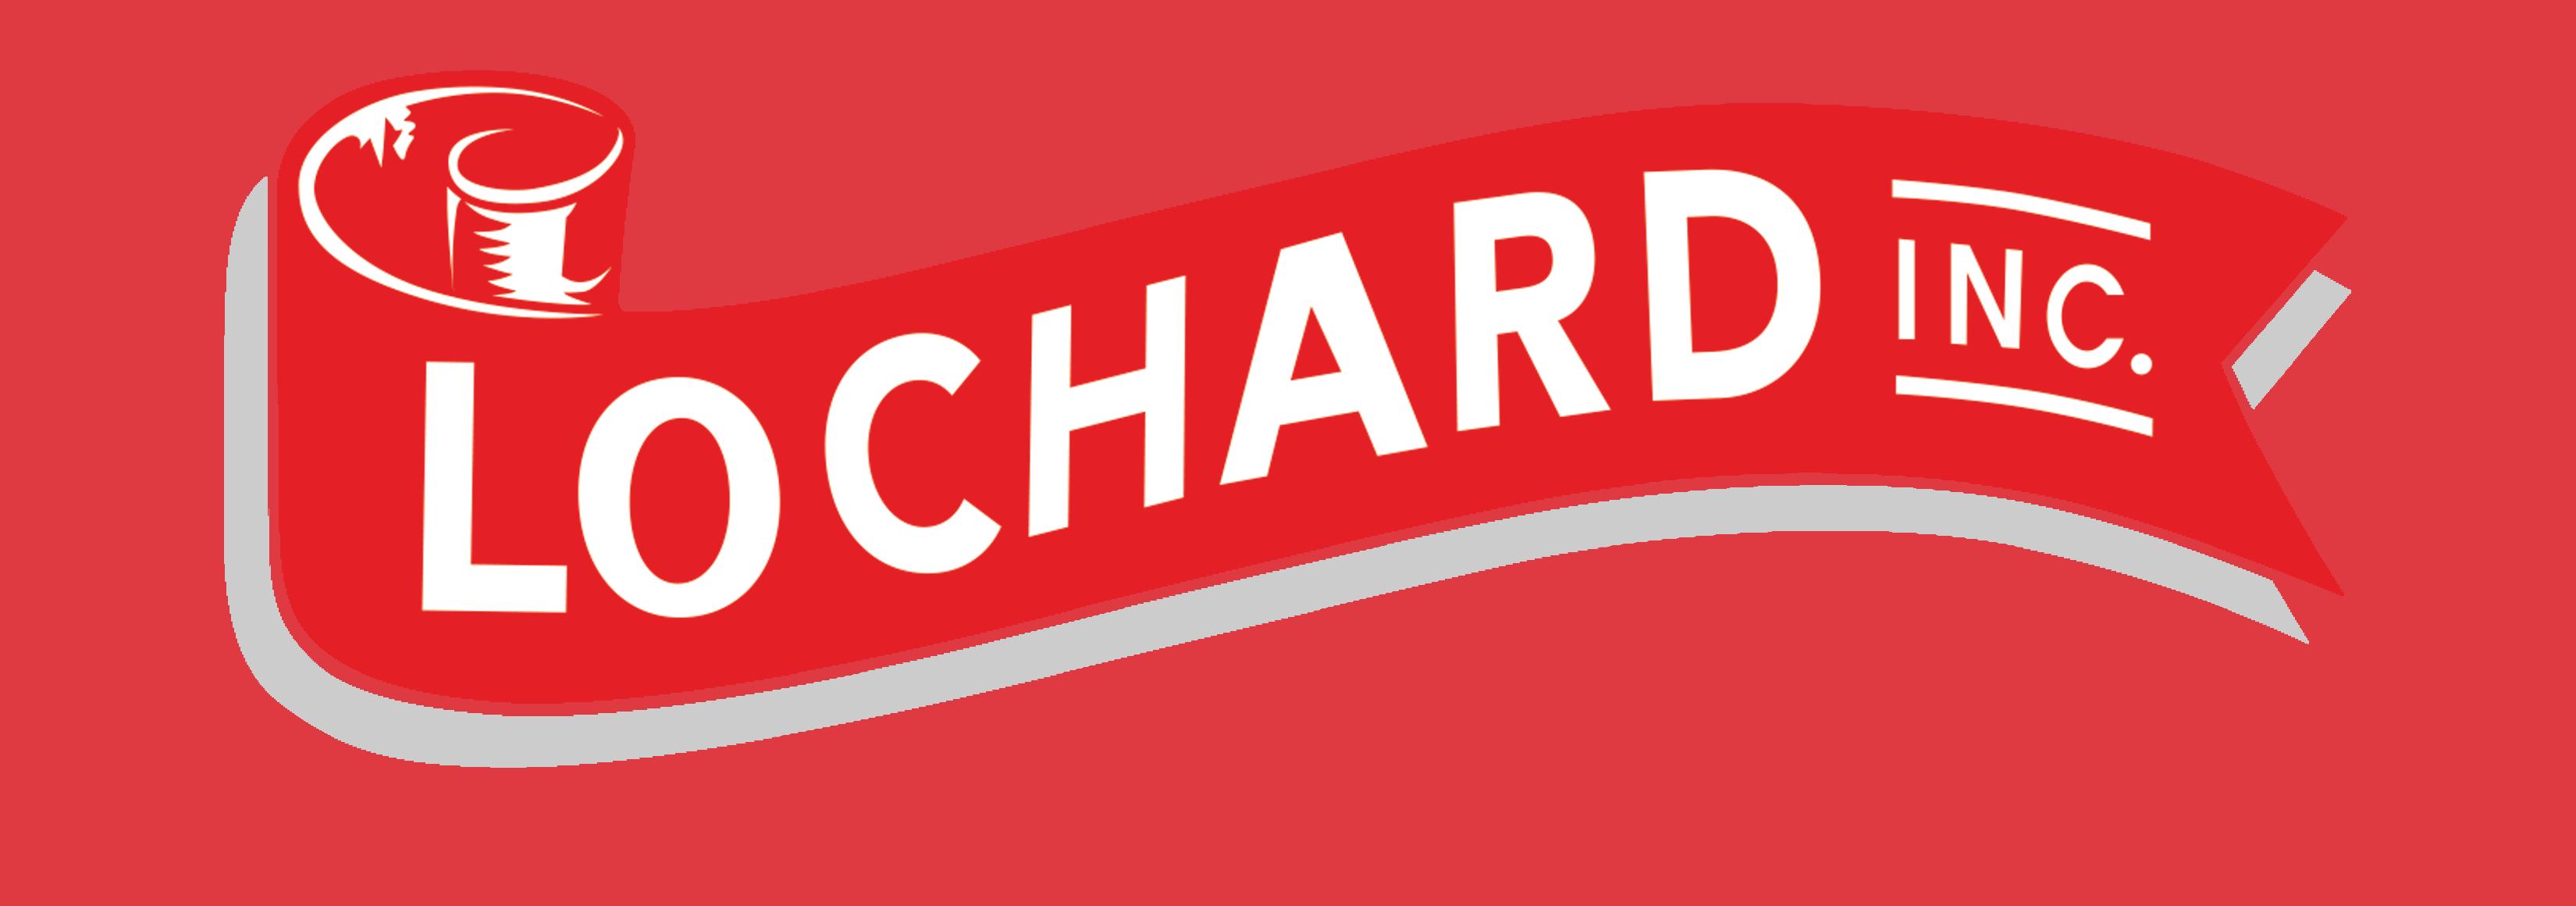 Lochard